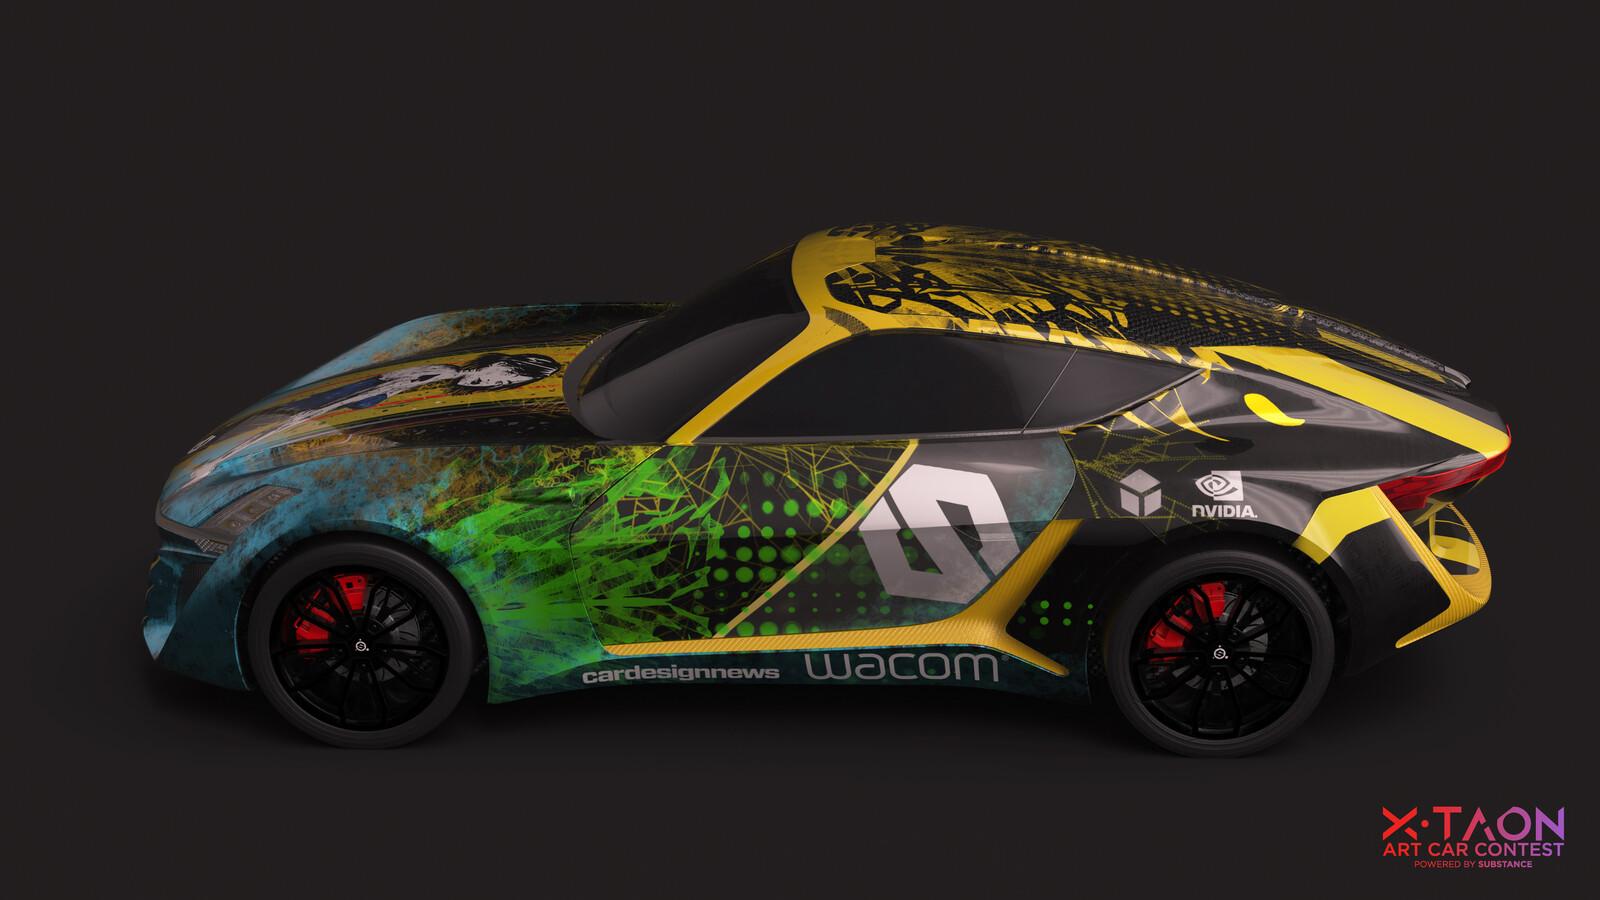 XTAON Art Car Contest Entry